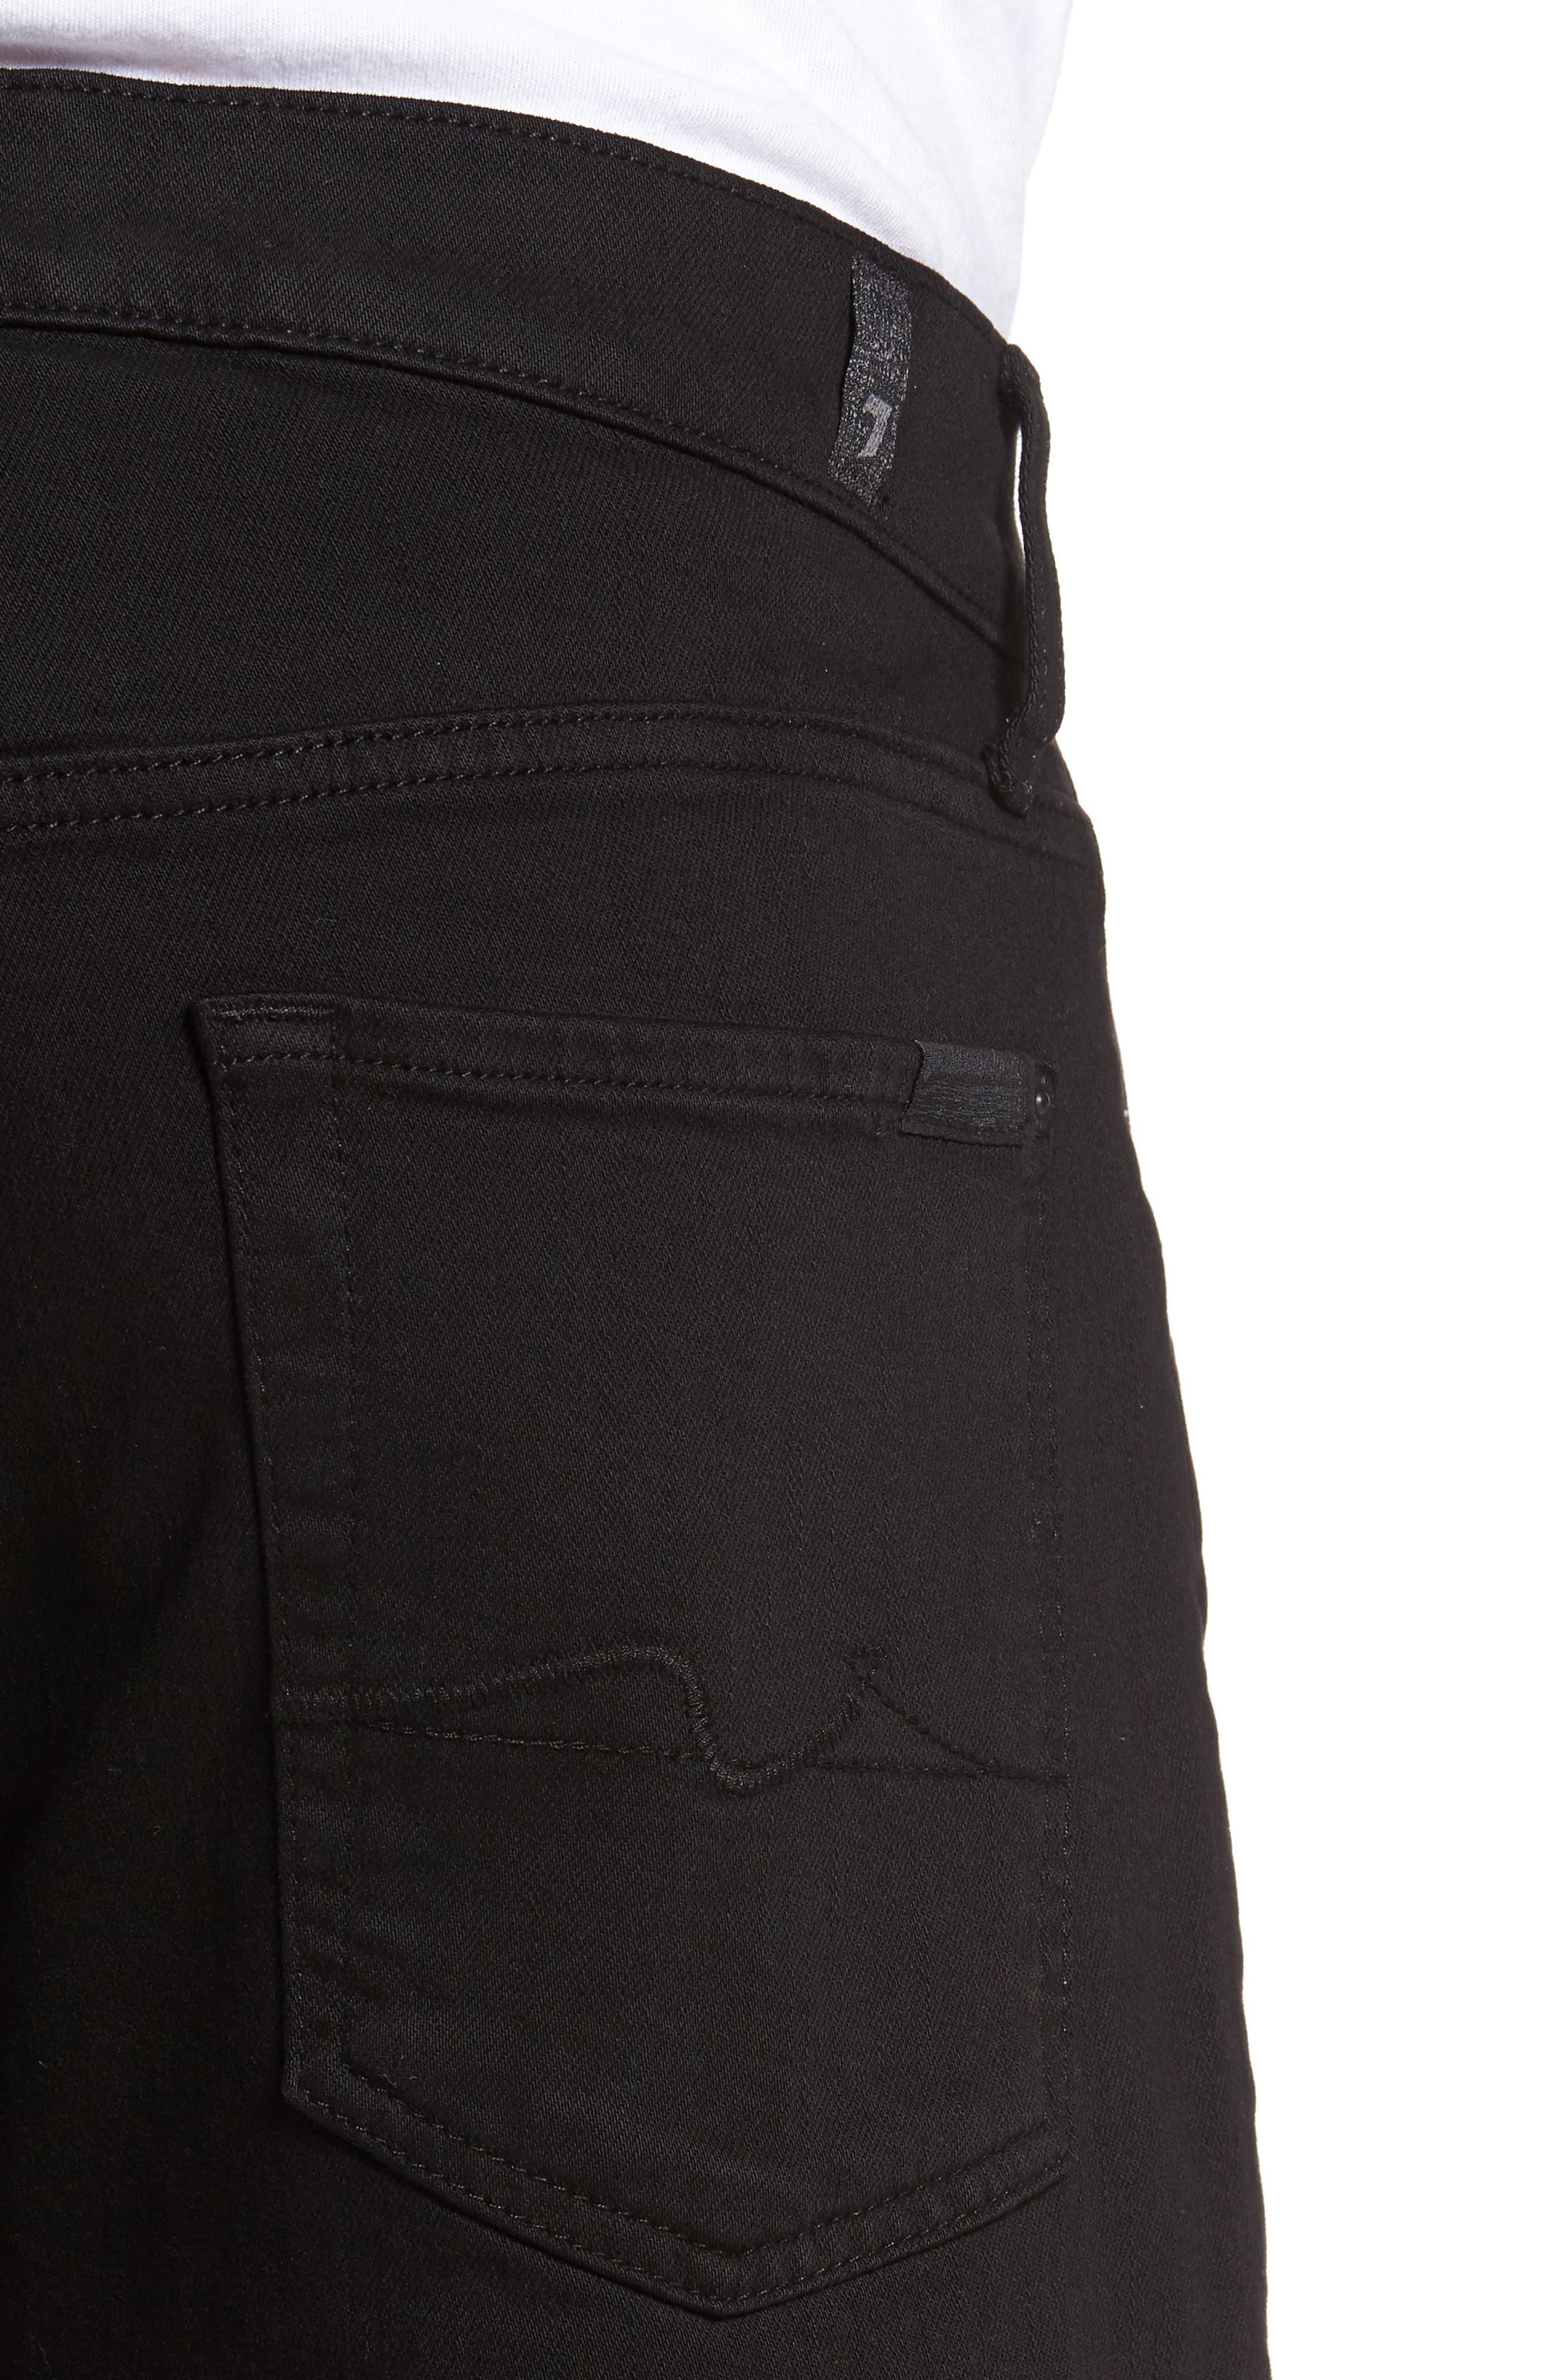 Luxe Performance - Slimmy Slim Fit Jeans,                             Alternate thumbnail 4, color,                             ANNEX BLACK